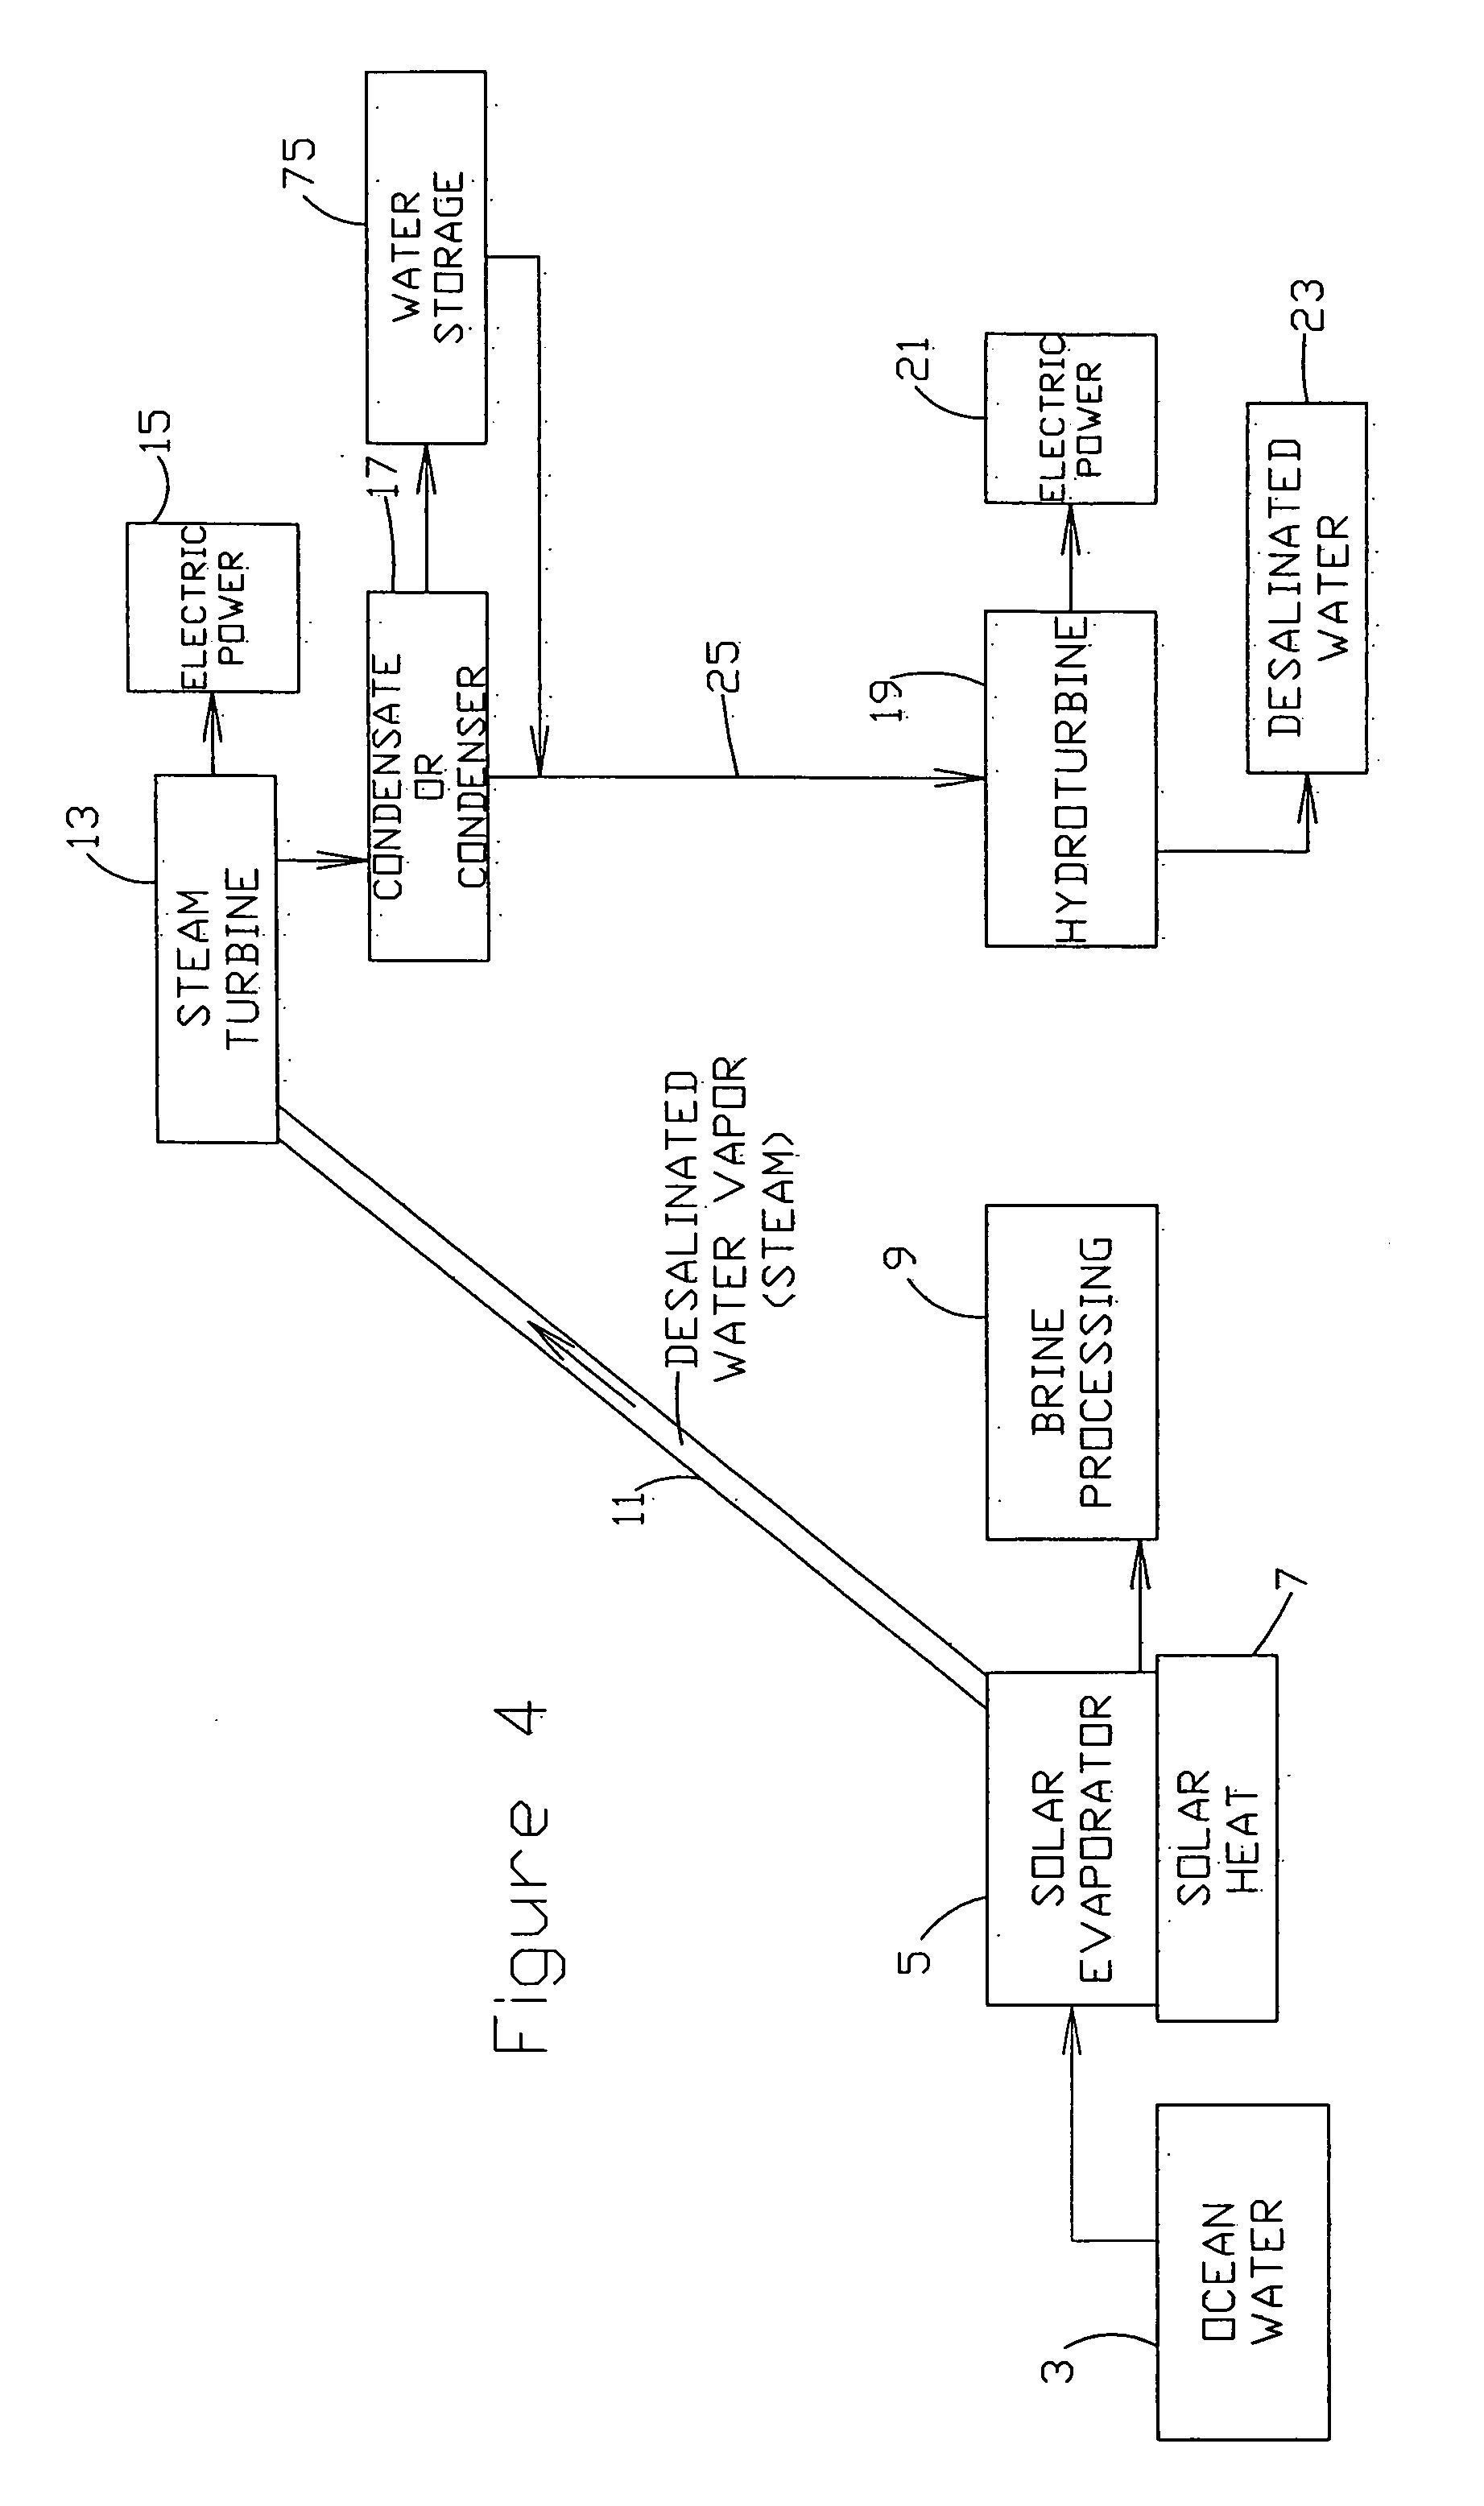 Patent US Solar desalination system Google Patents